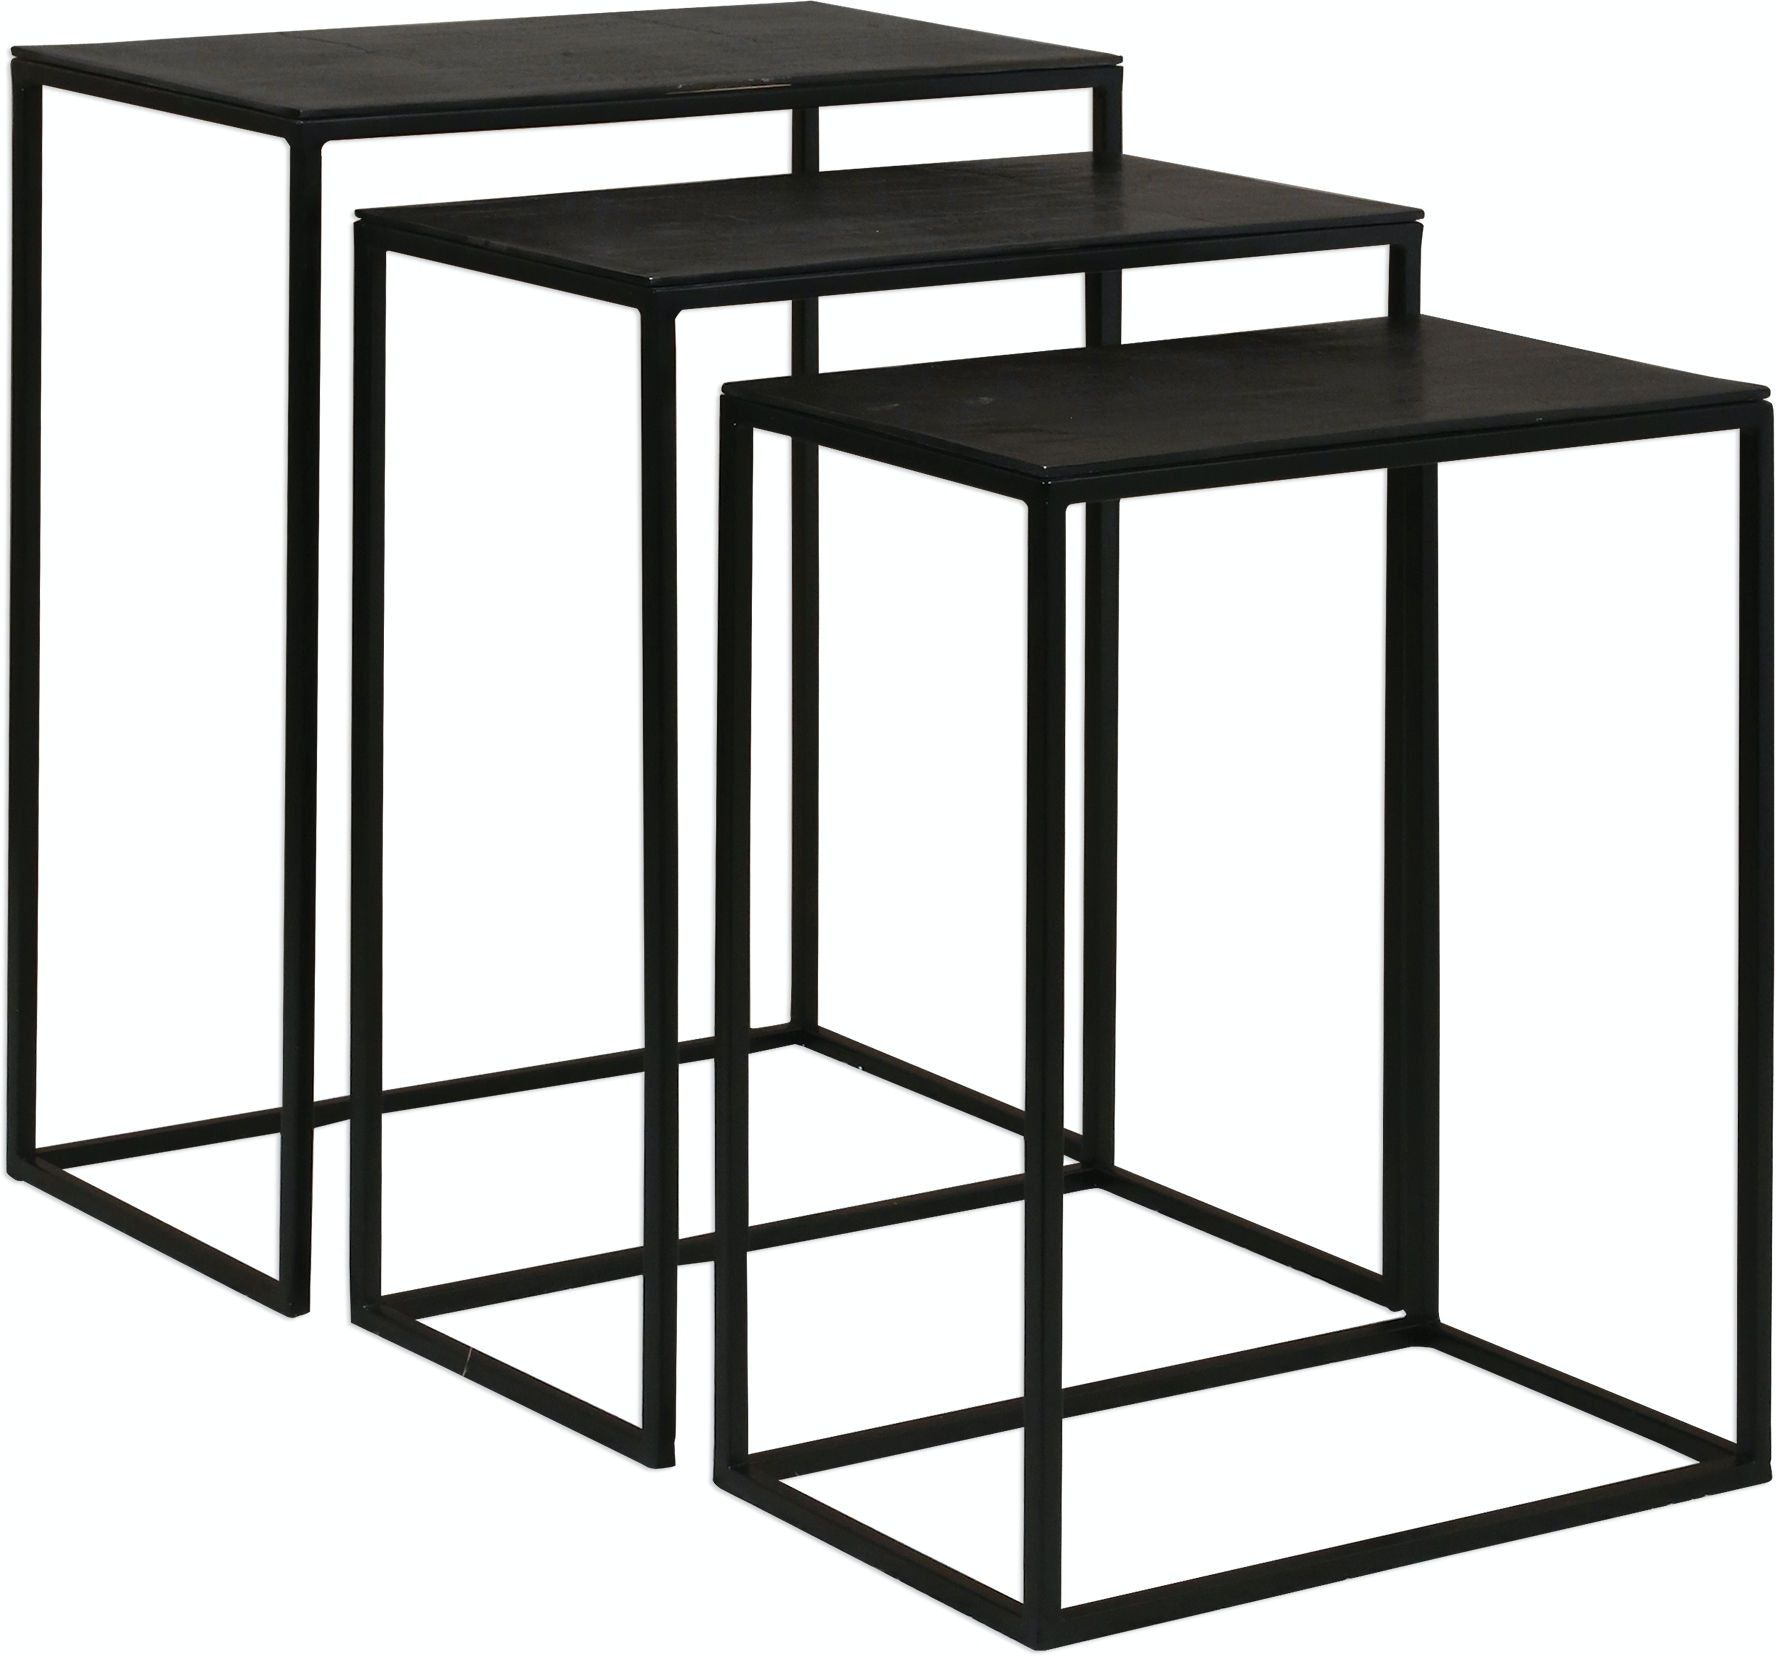 Uttermost Living Room Coreene Iron Nesting Tables S 3 25040 High Point Furniture Jasper And